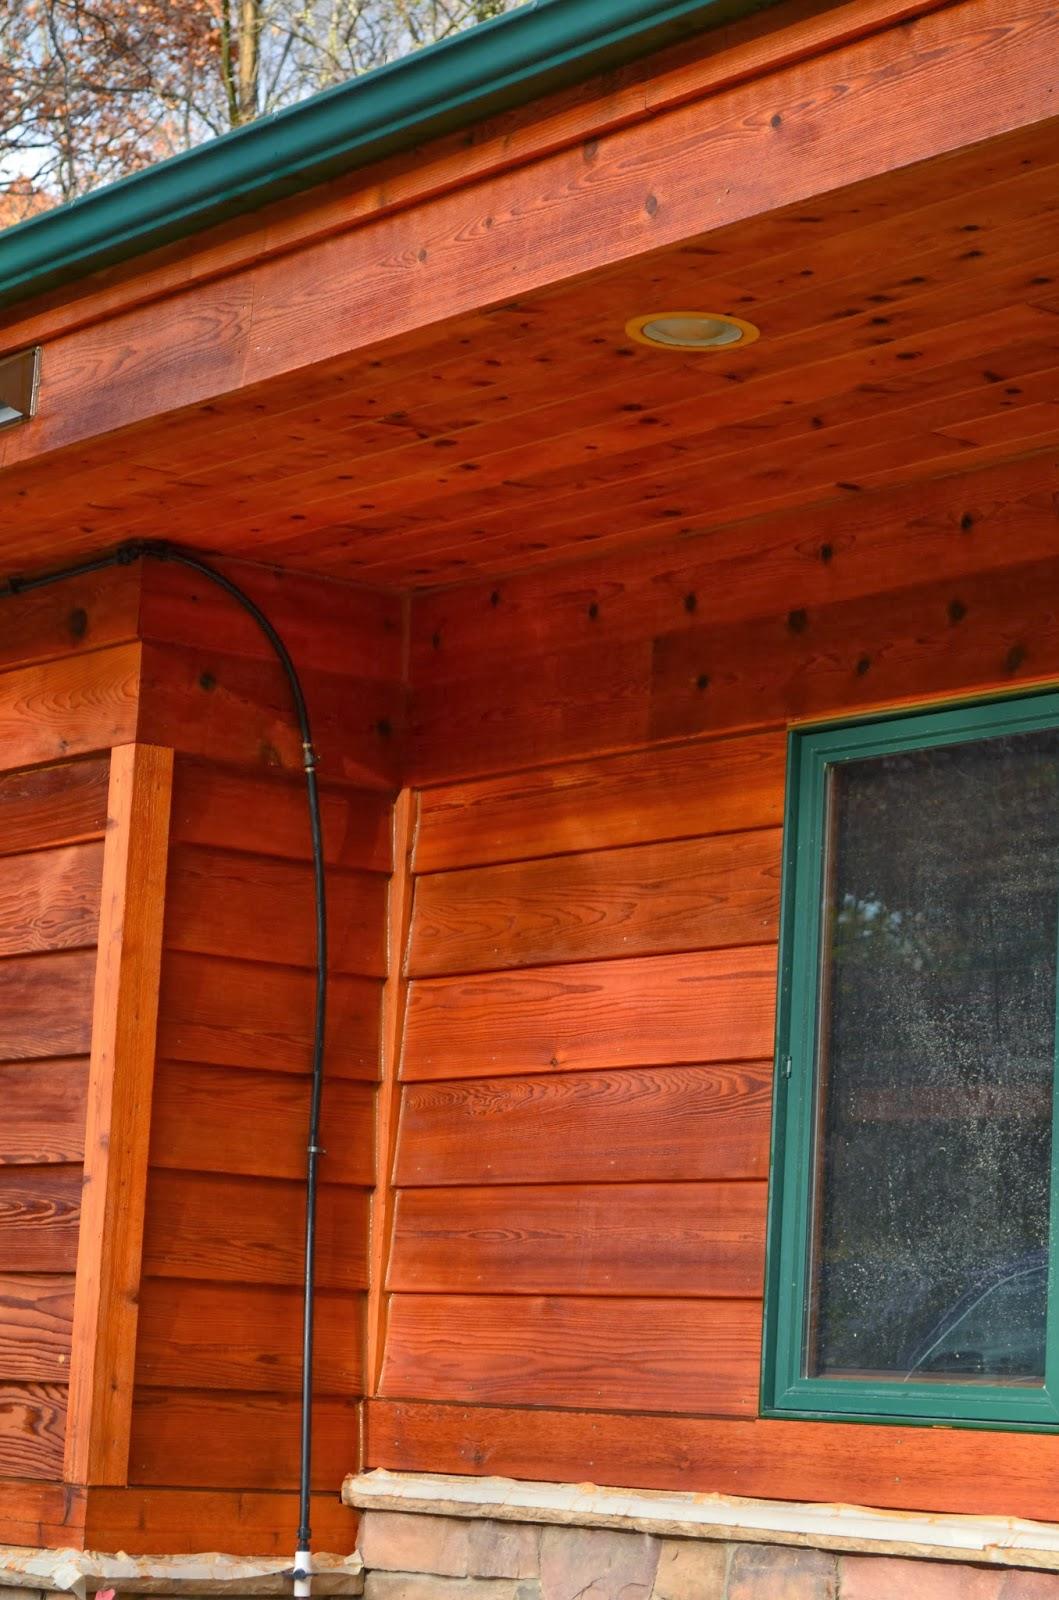 Stained House Siding : Cedar siding stain technique november